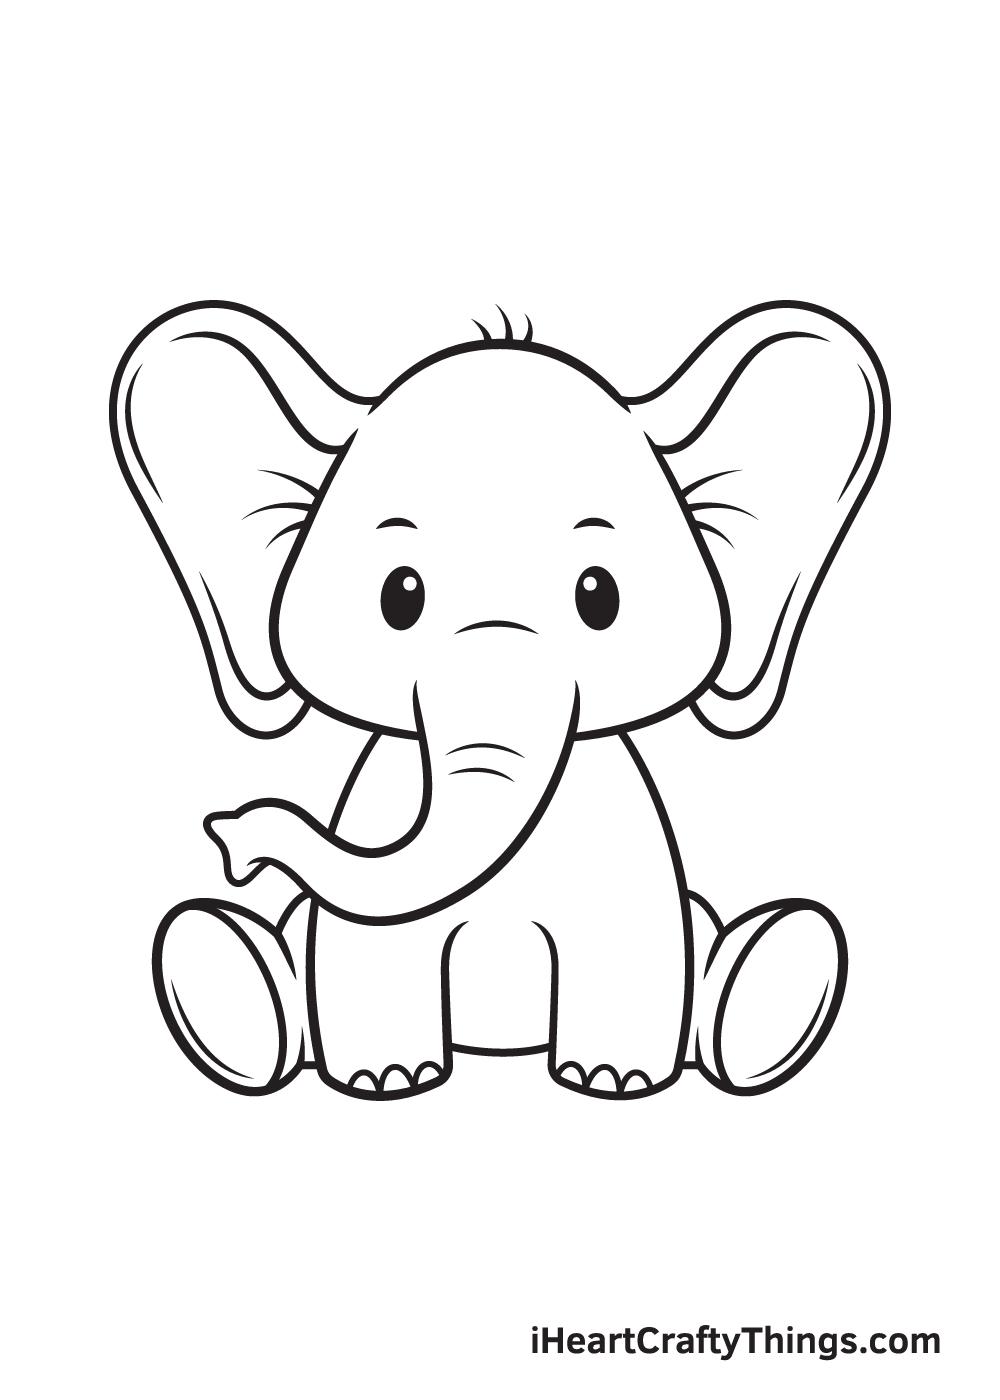 Vẽ con voi - Bước 9